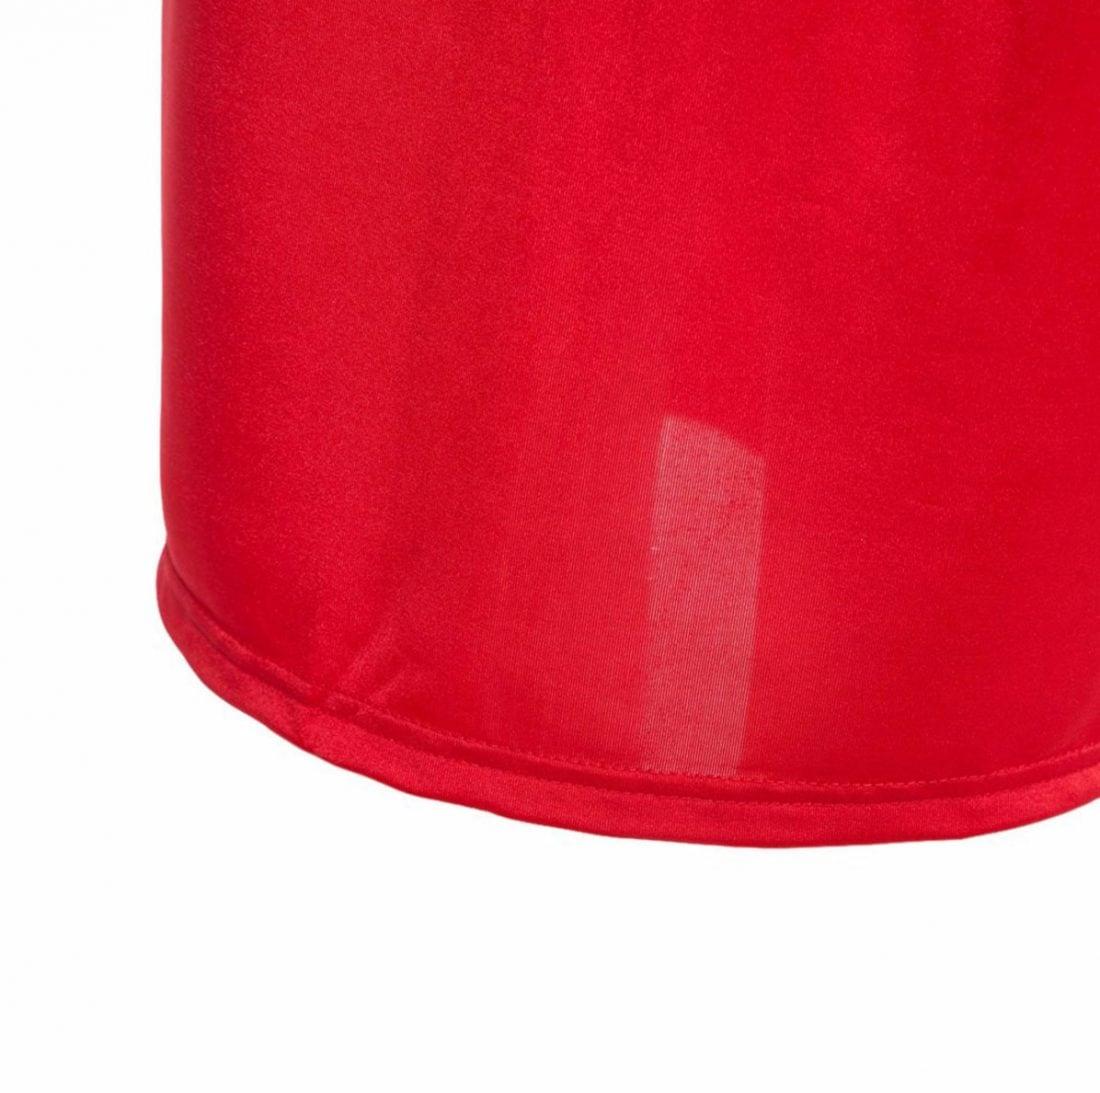 M0188 red9 Short Sleeve Dresses maureens.com boutique